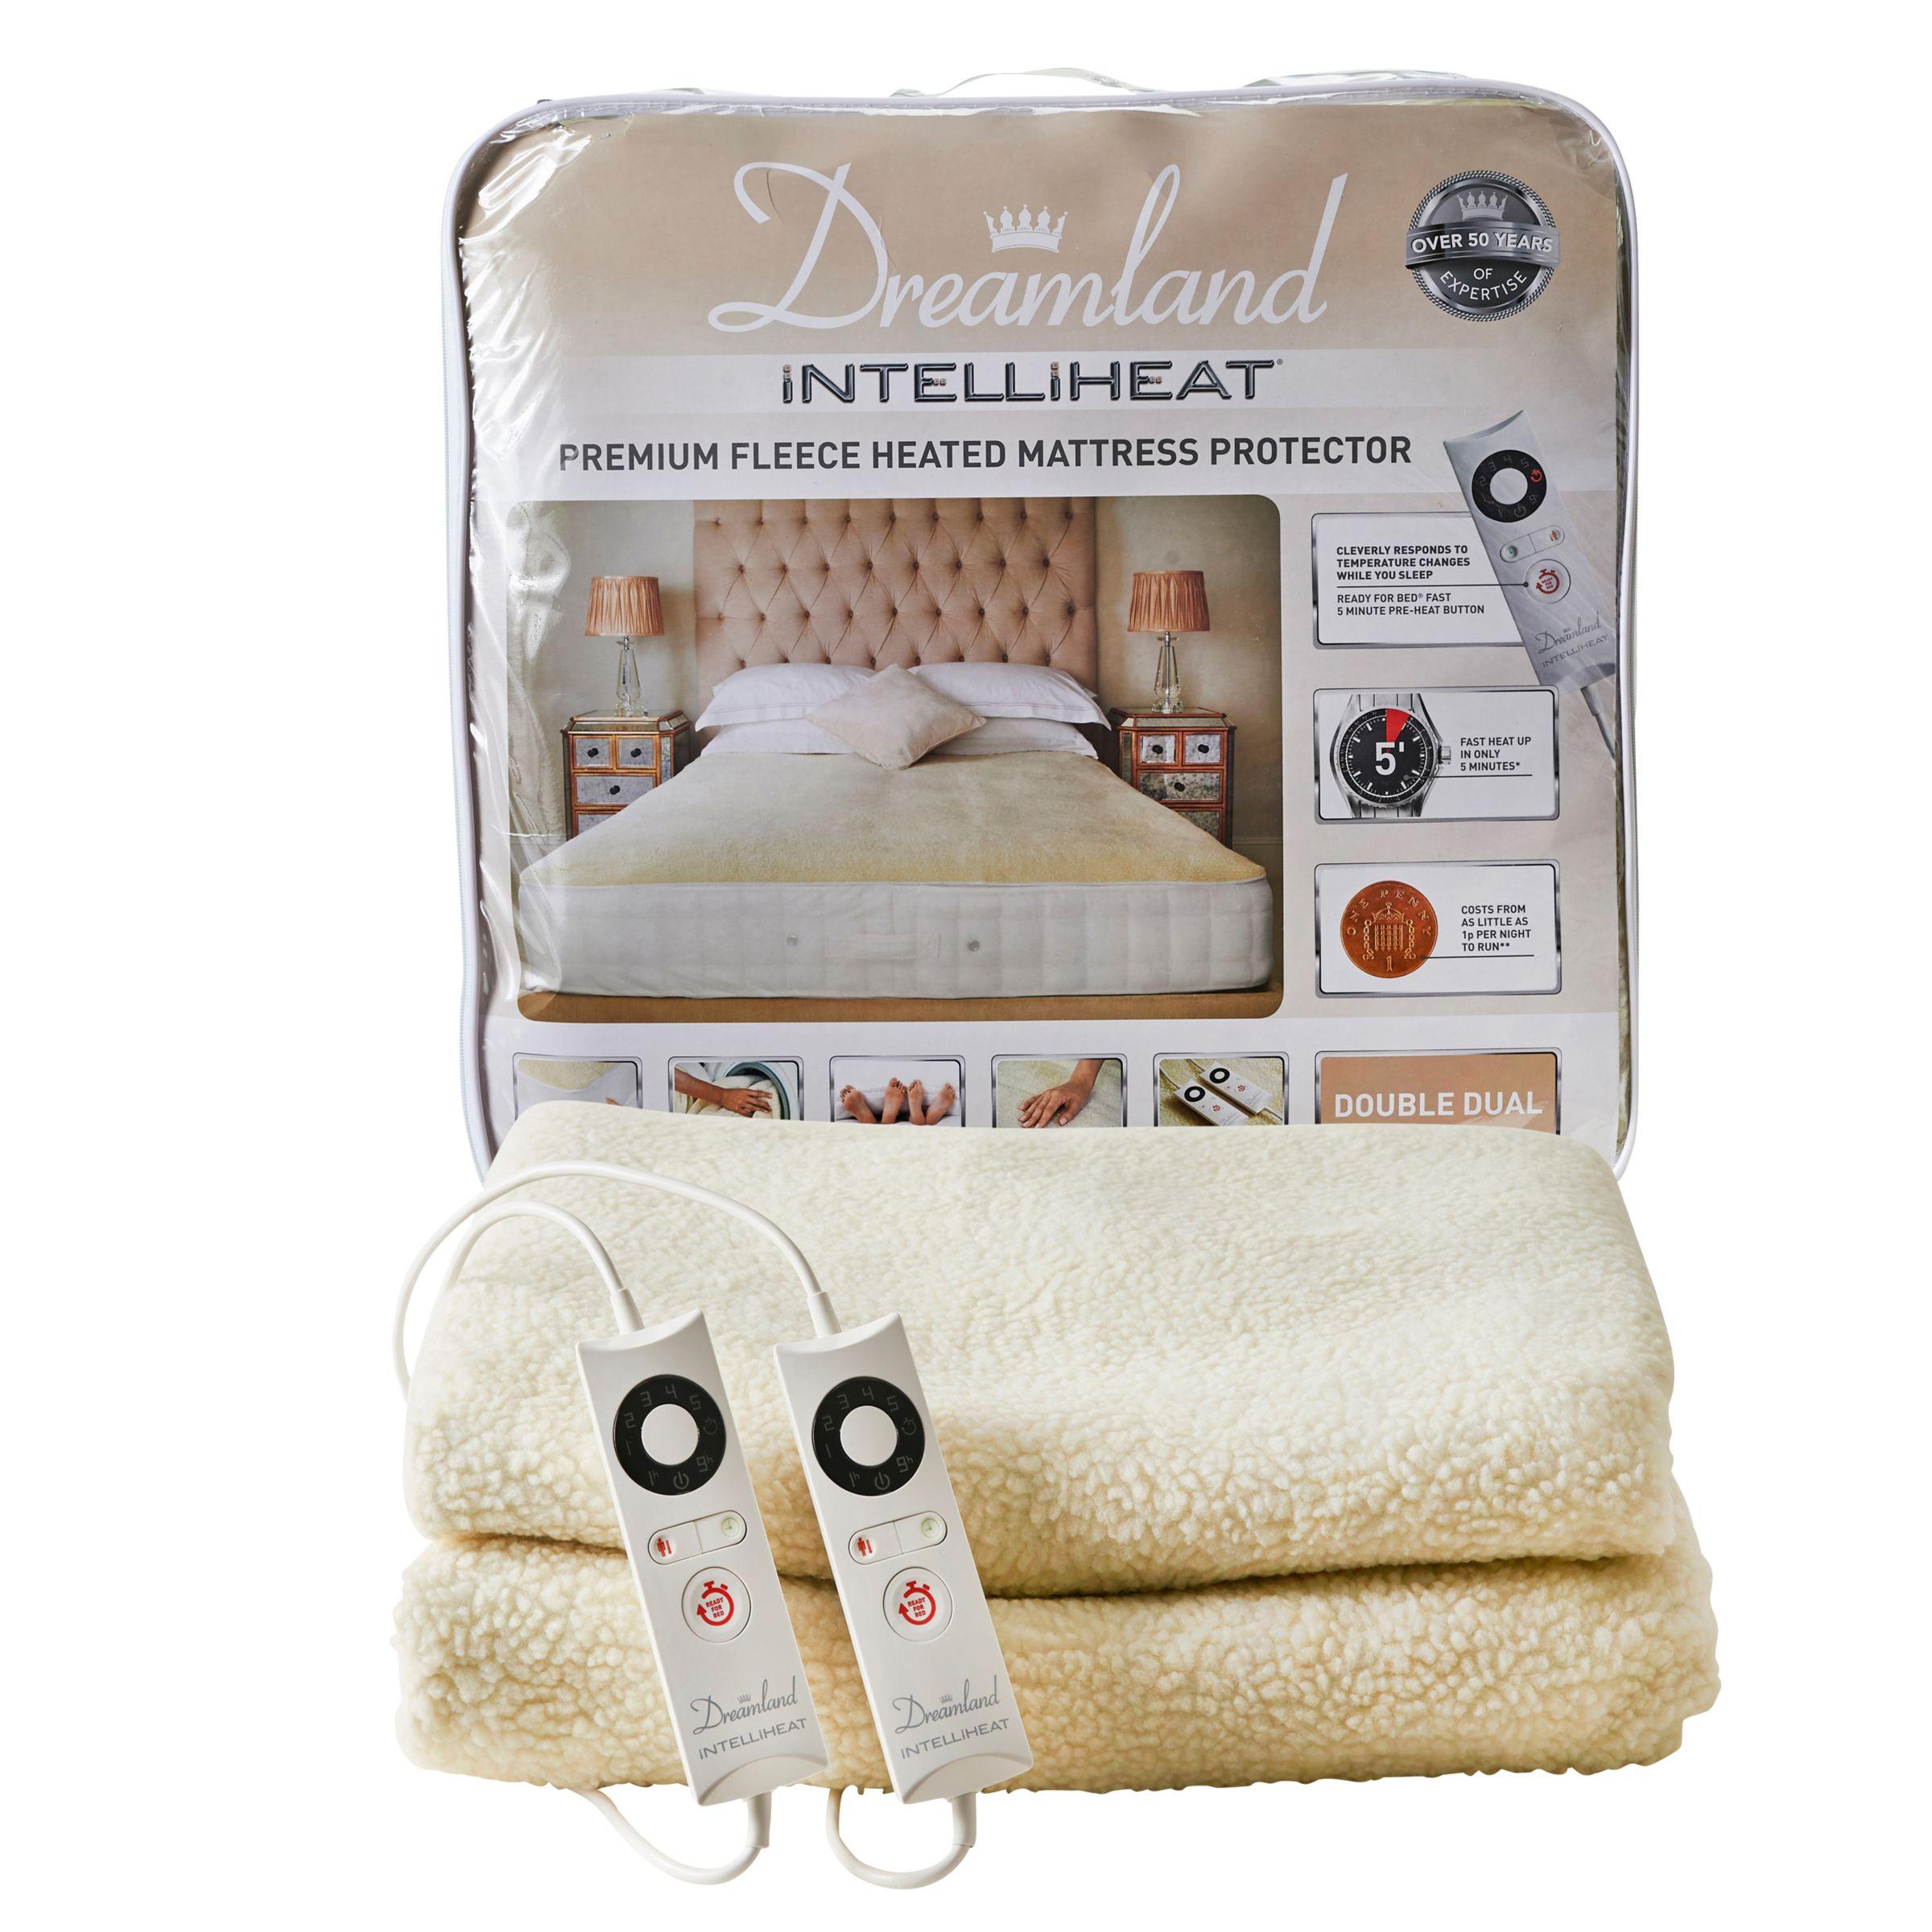 Dreamland Dreamland Heated Fleece Fitted Dual Control Mattress Protector